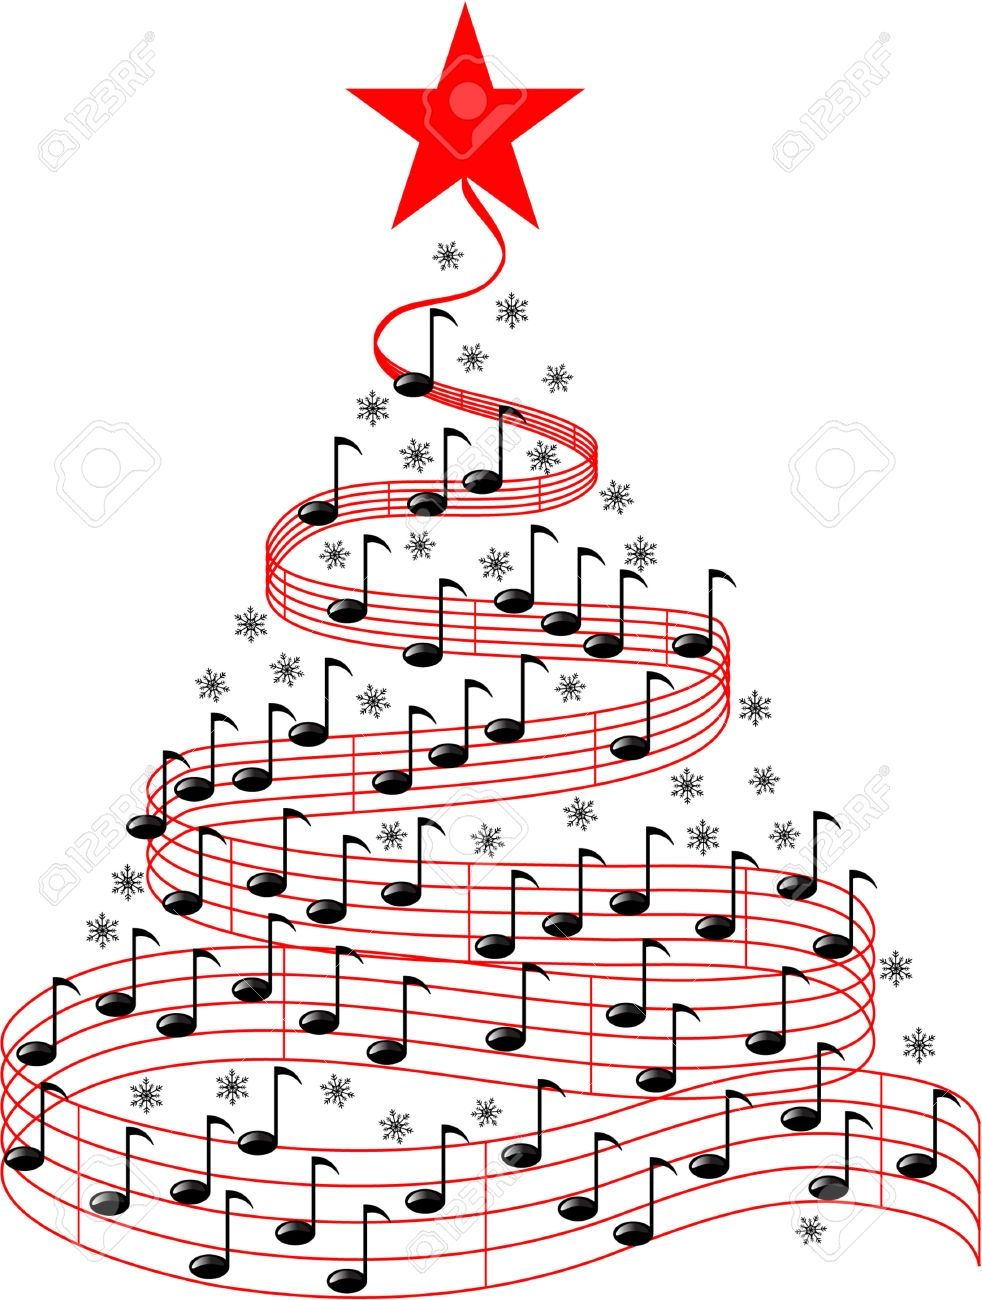 Christmas Music Clipart.New Christmas Music Clipart Design Digital Clipart